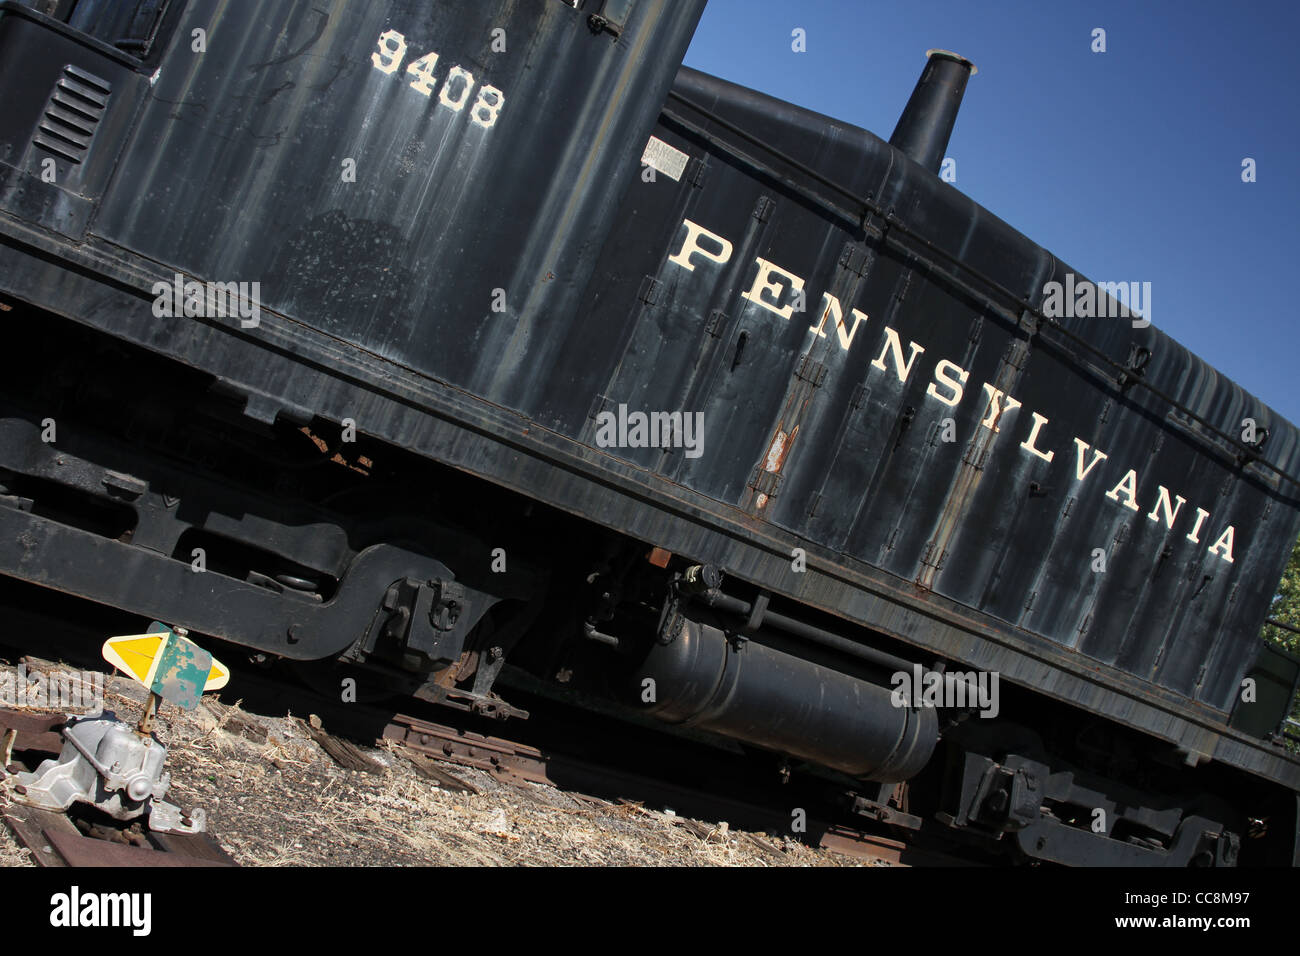 The word Pennsylvania. Pennsylvania Railroad 9408 locomotive. - Stock Image